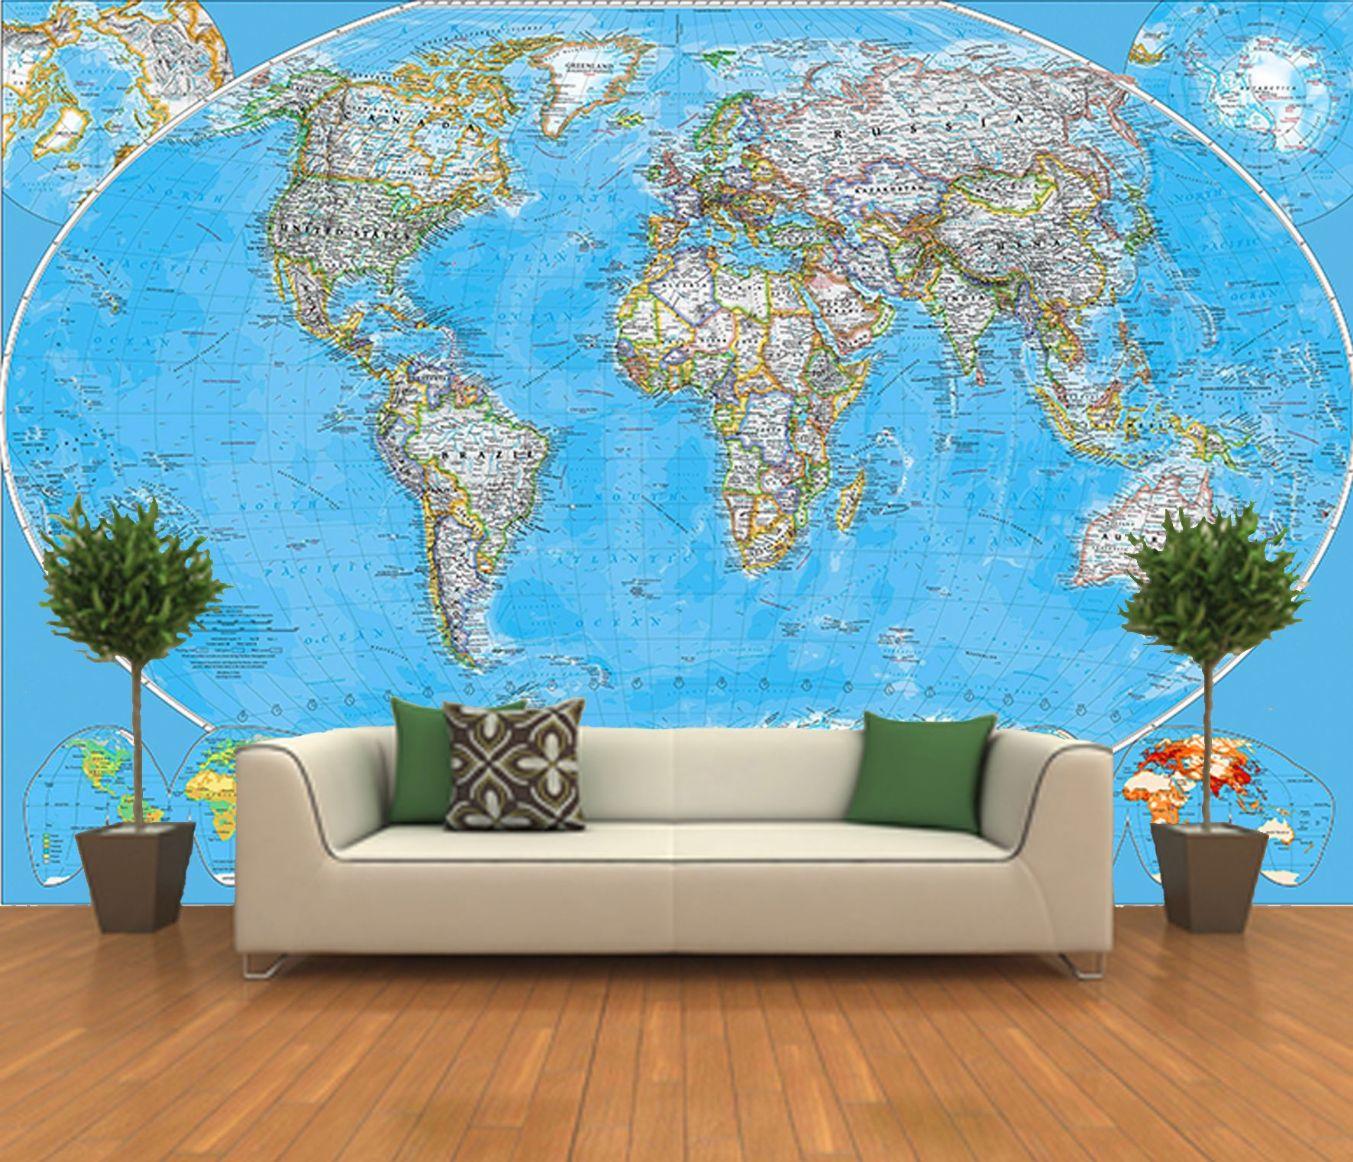 World map wallpaper mural 22 wallpapers adorable for Mural wallpaper